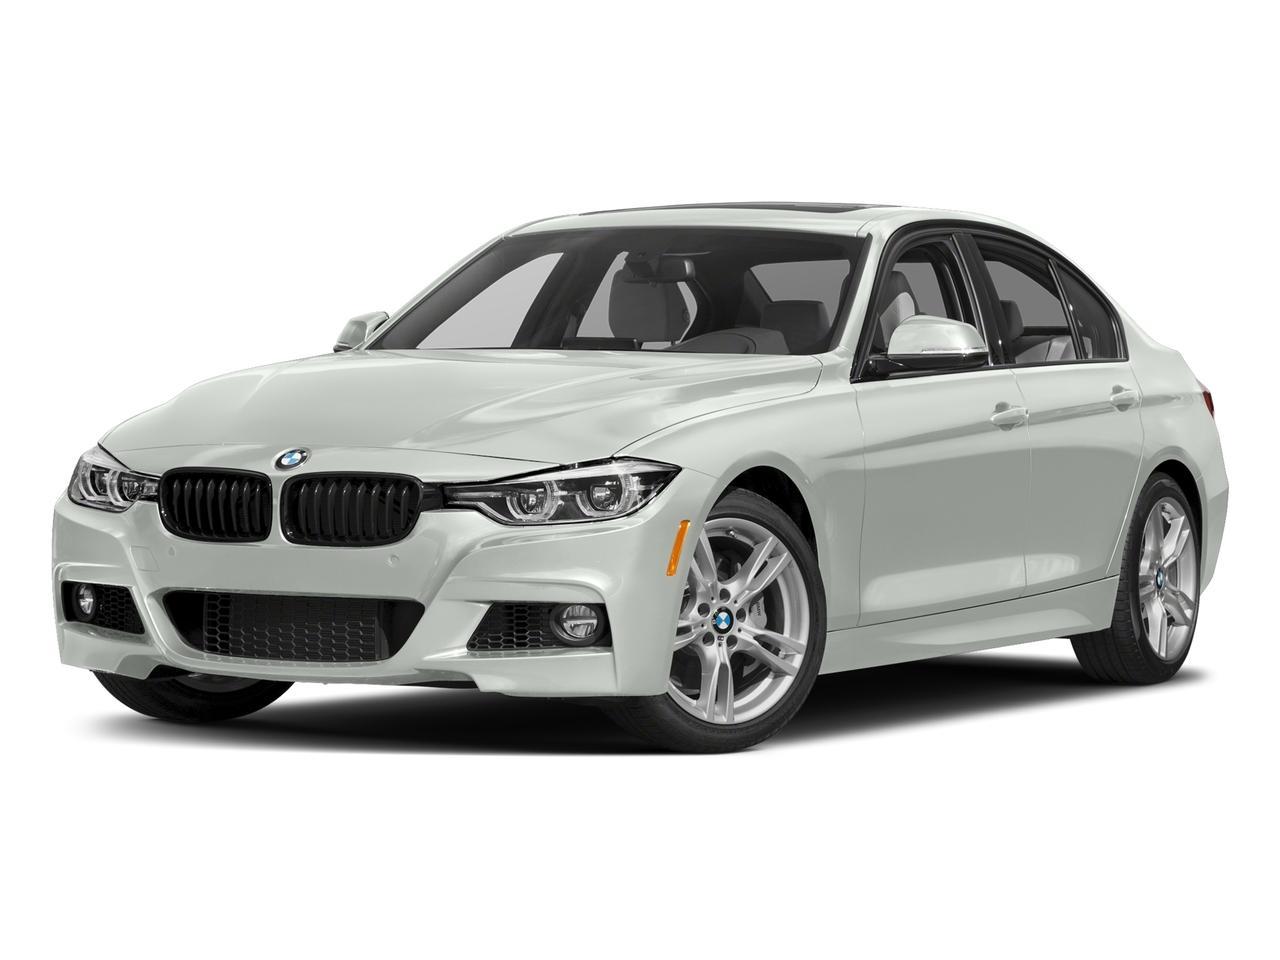 2017 BMW 340i Vehicle Photo in Pleasanton, CA 94588